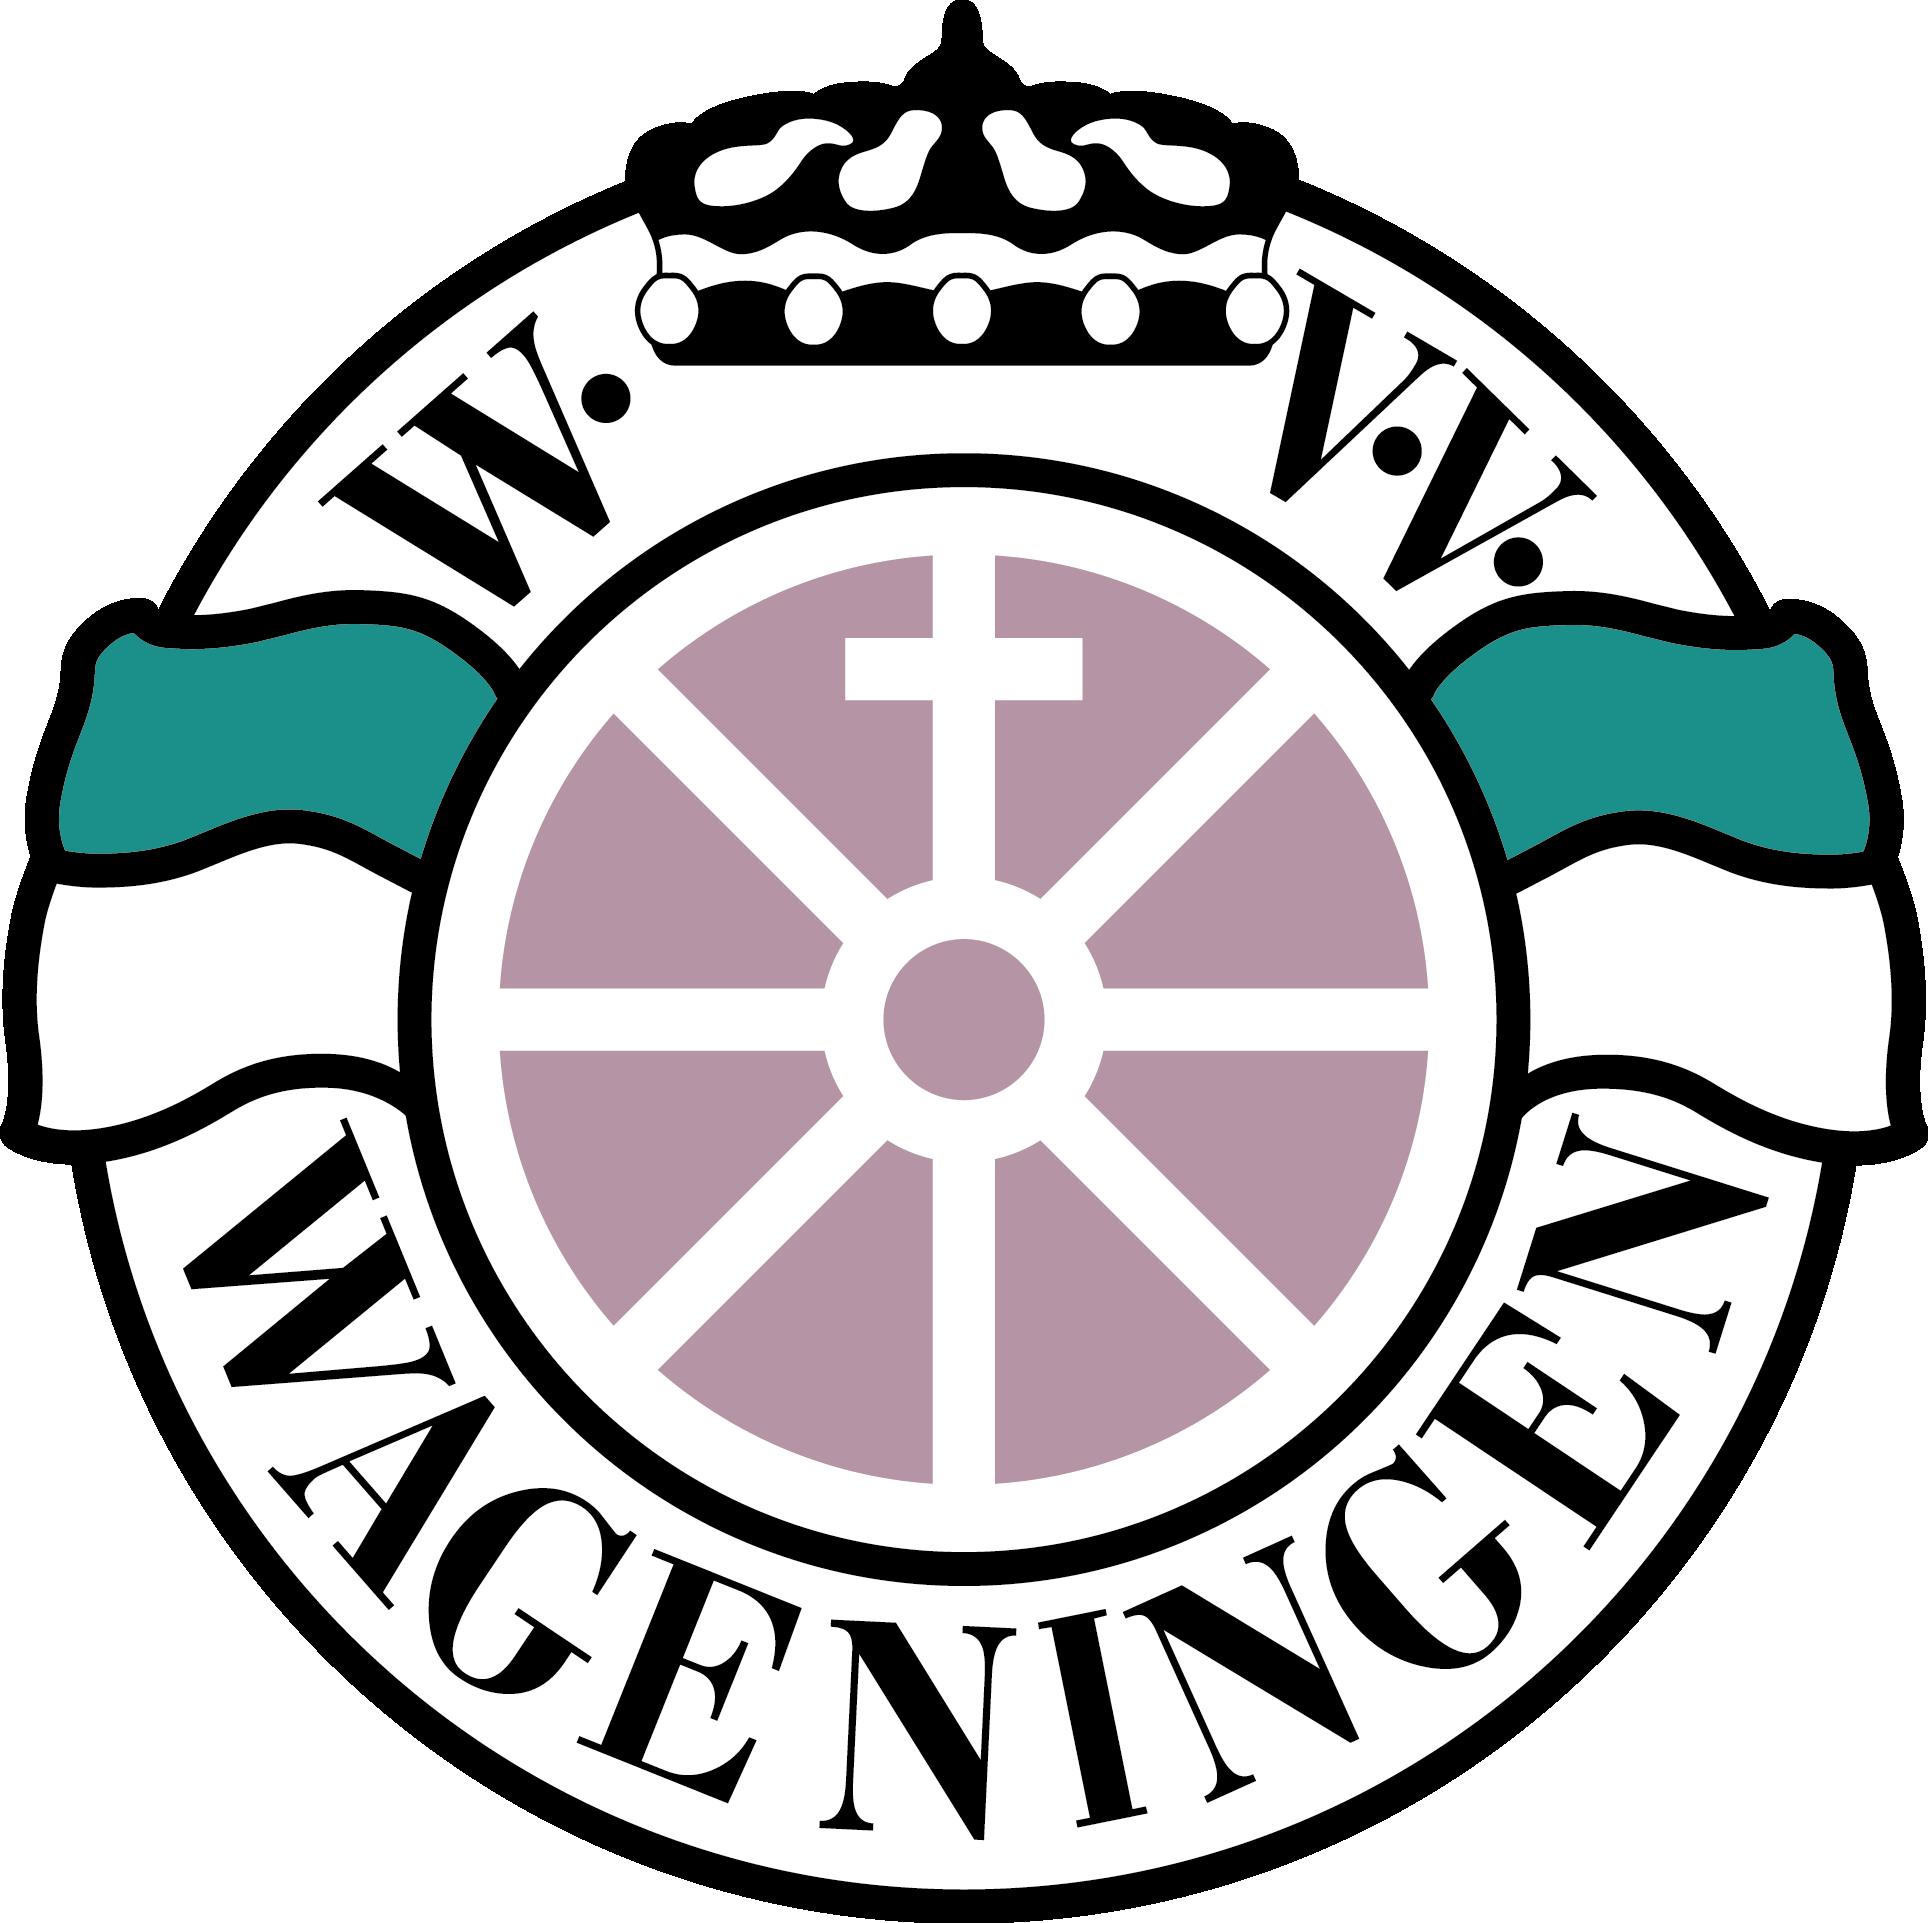 Wvv Wageningen Nl Voetbal